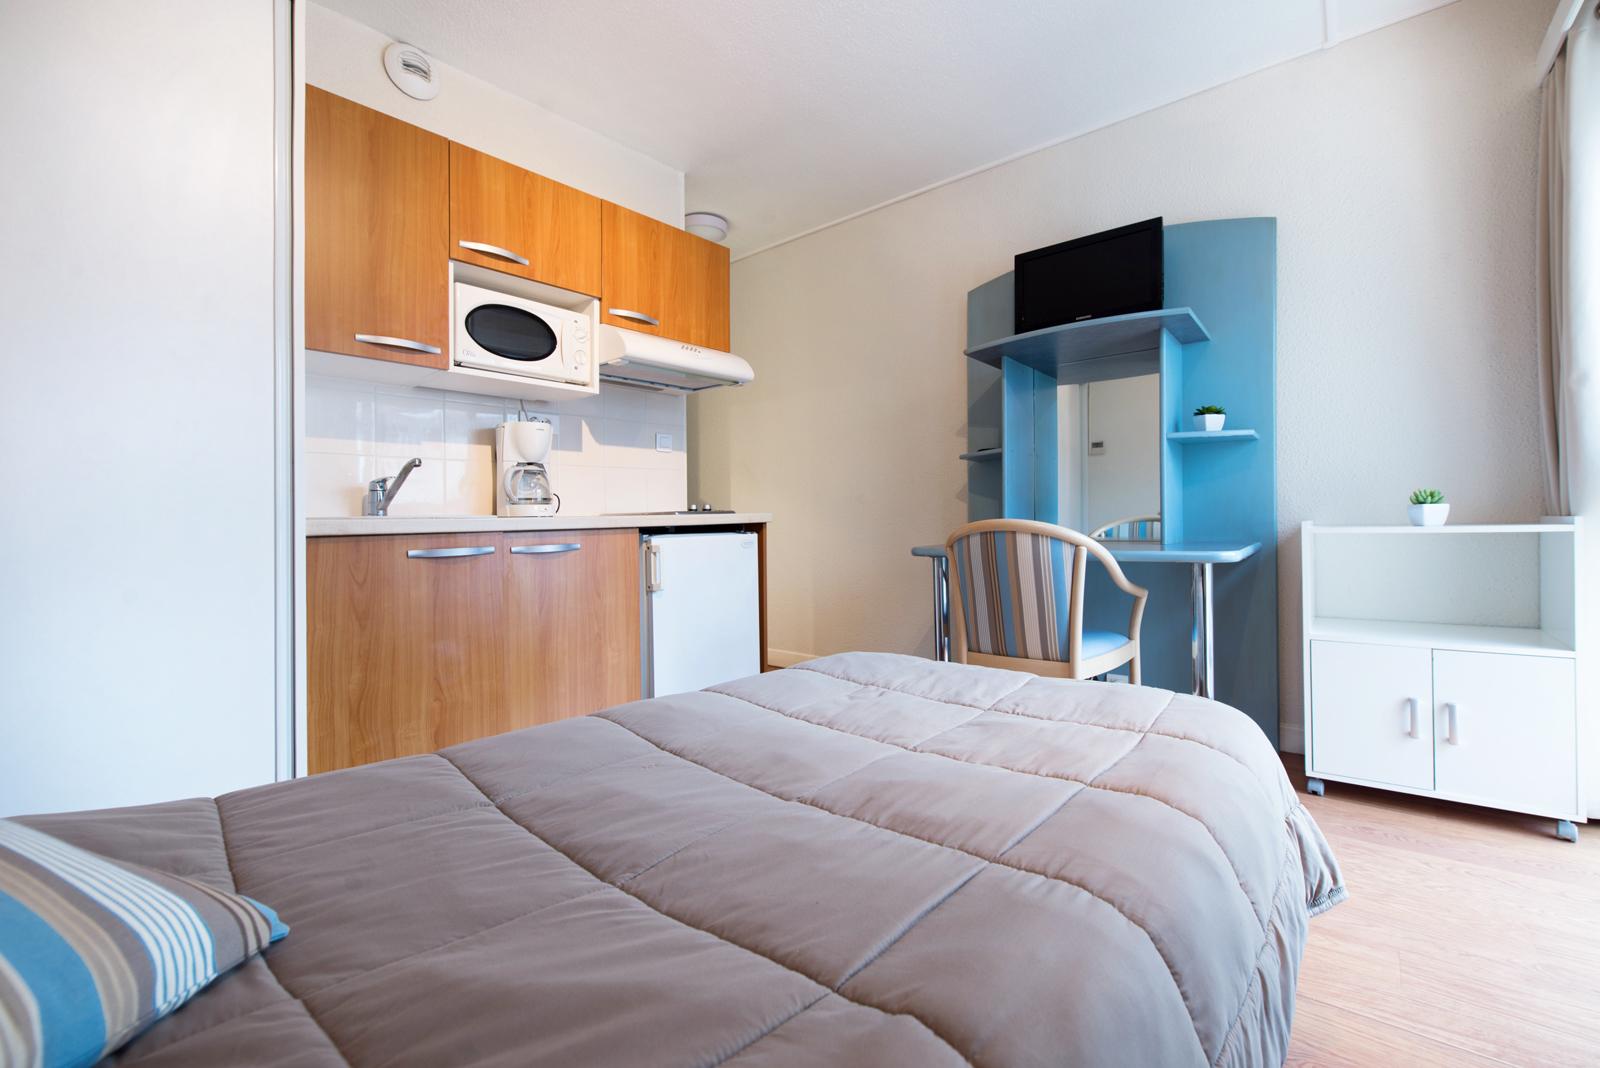 location studio 1 pers lit 90 pour cure dax proche thermes. Black Bedroom Furniture Sets. Home Design Ideas